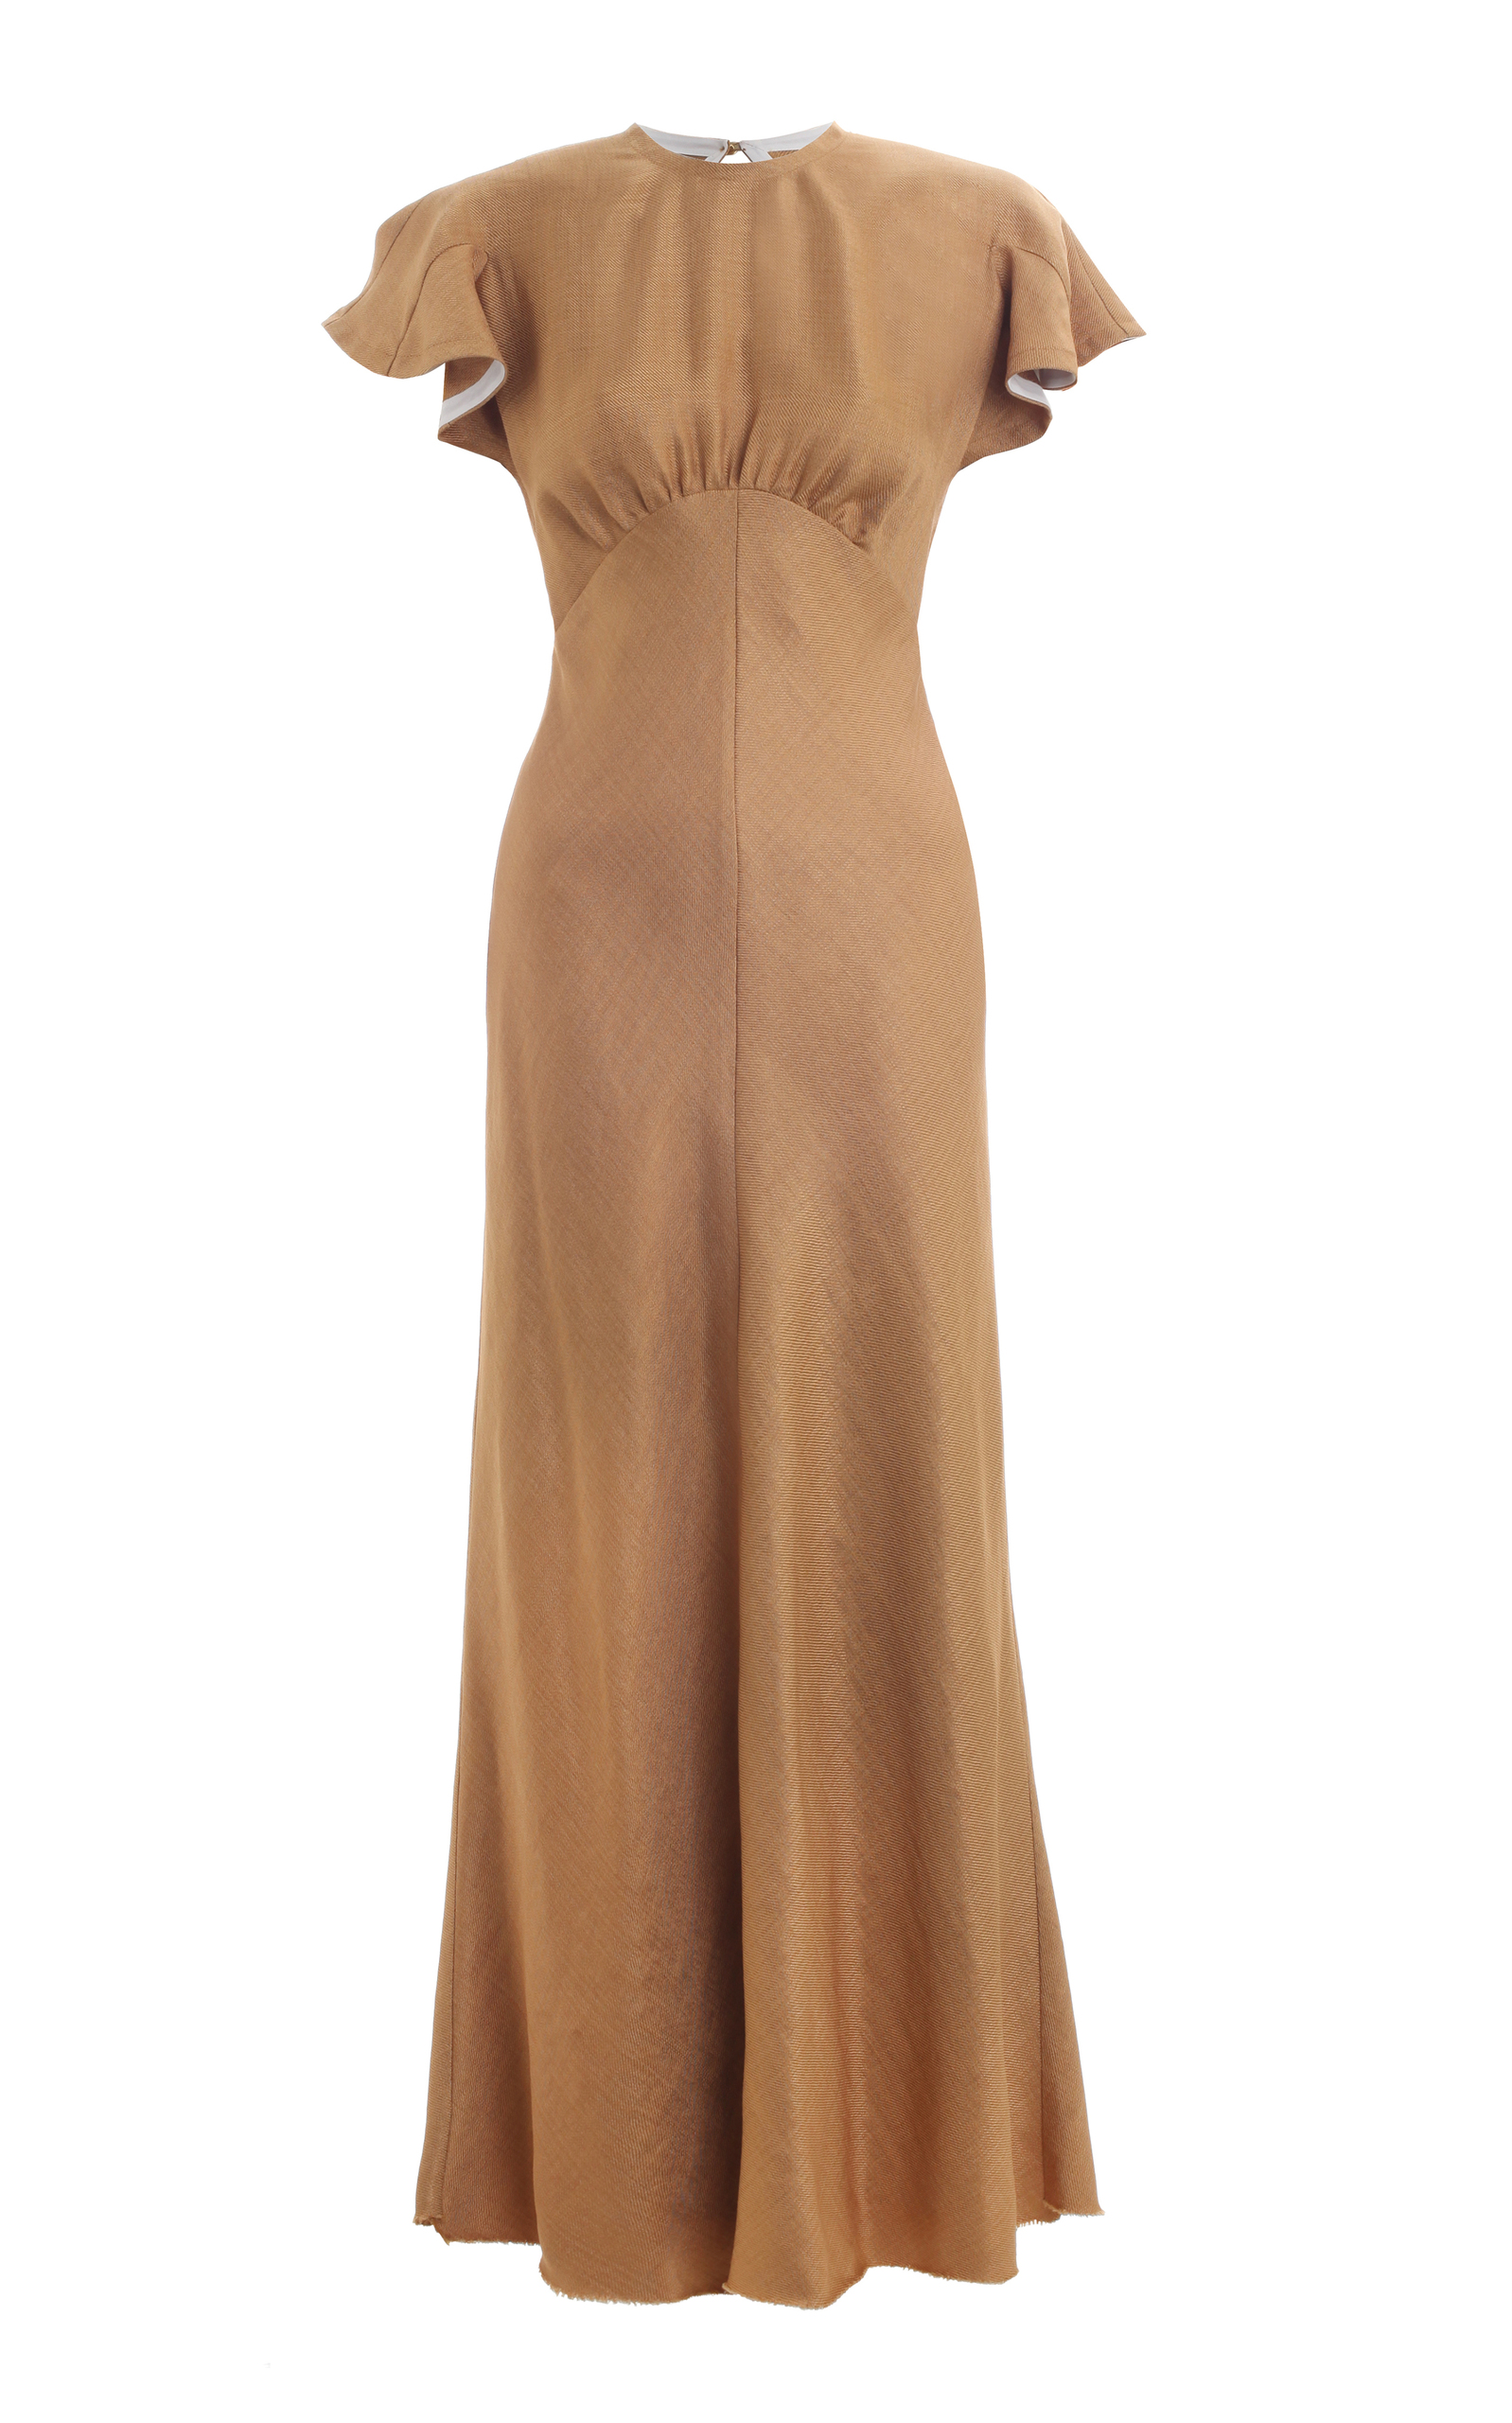 Zimmermann Woman Striped Stretch-jersey Midi Dress Light Brown Size 3 Zimmermann xli0t1SlYJ